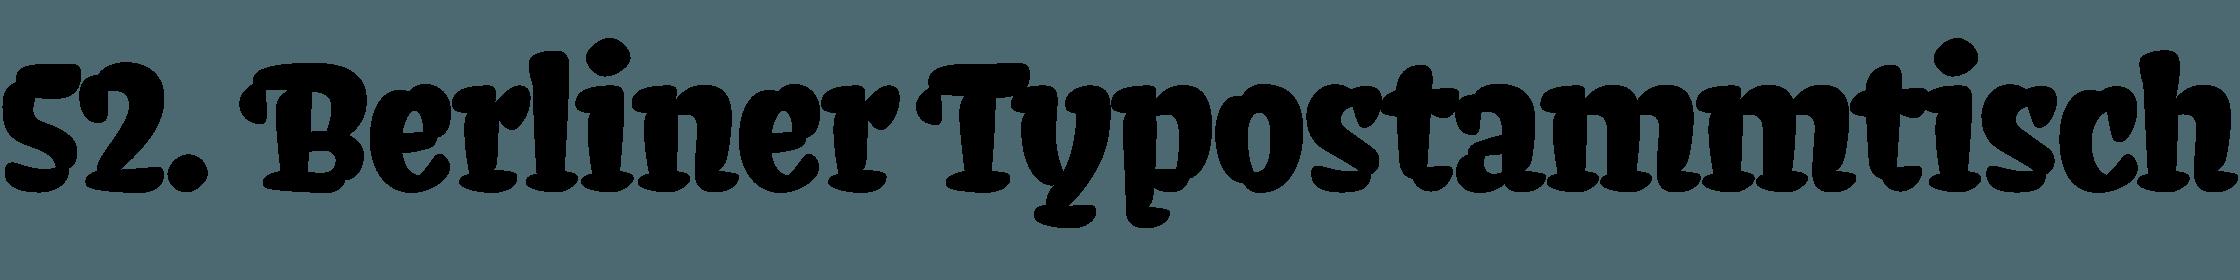 28.01.16: Mastering Type 2015